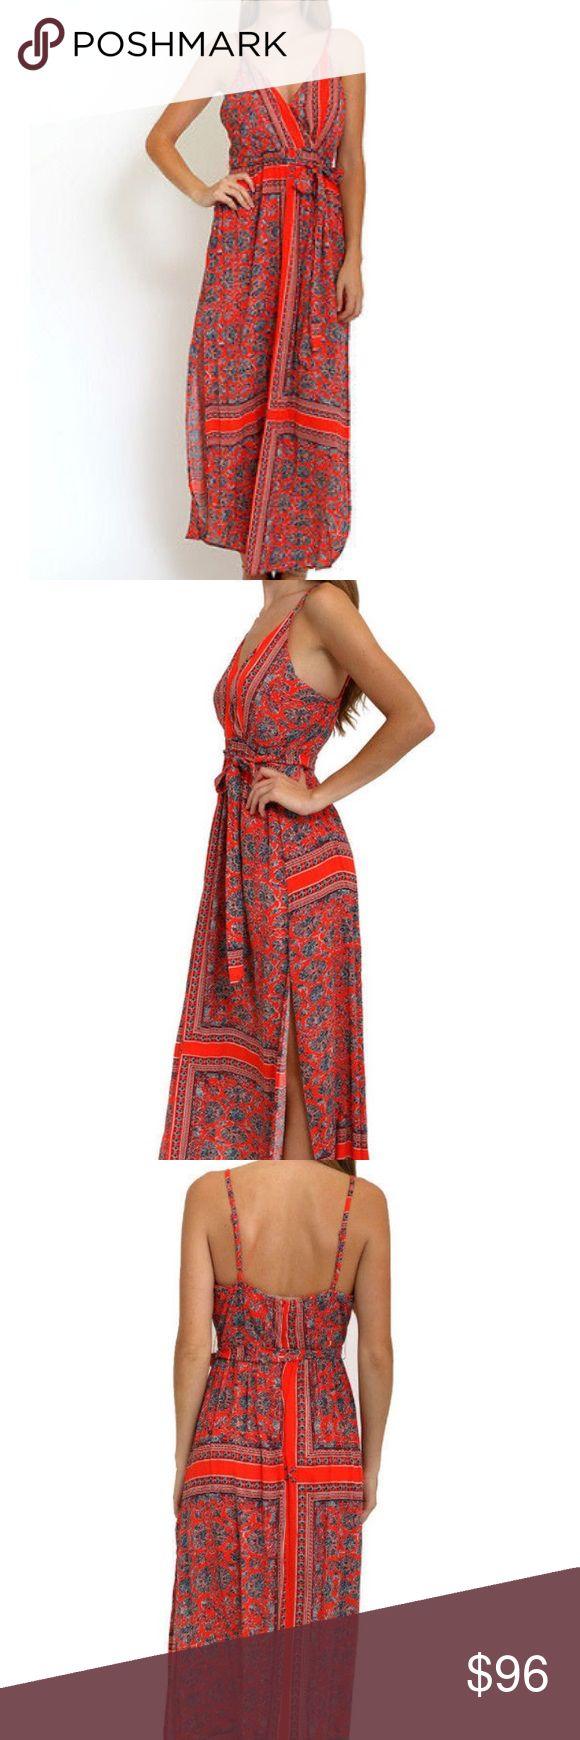 !PINK SALE! Casual Sundress Beach Boho Maxi Dress Cute Summer casual sundress, has a long length breezy style chic design. Features: 100% rayon. Hand wash. Dresses Maxi